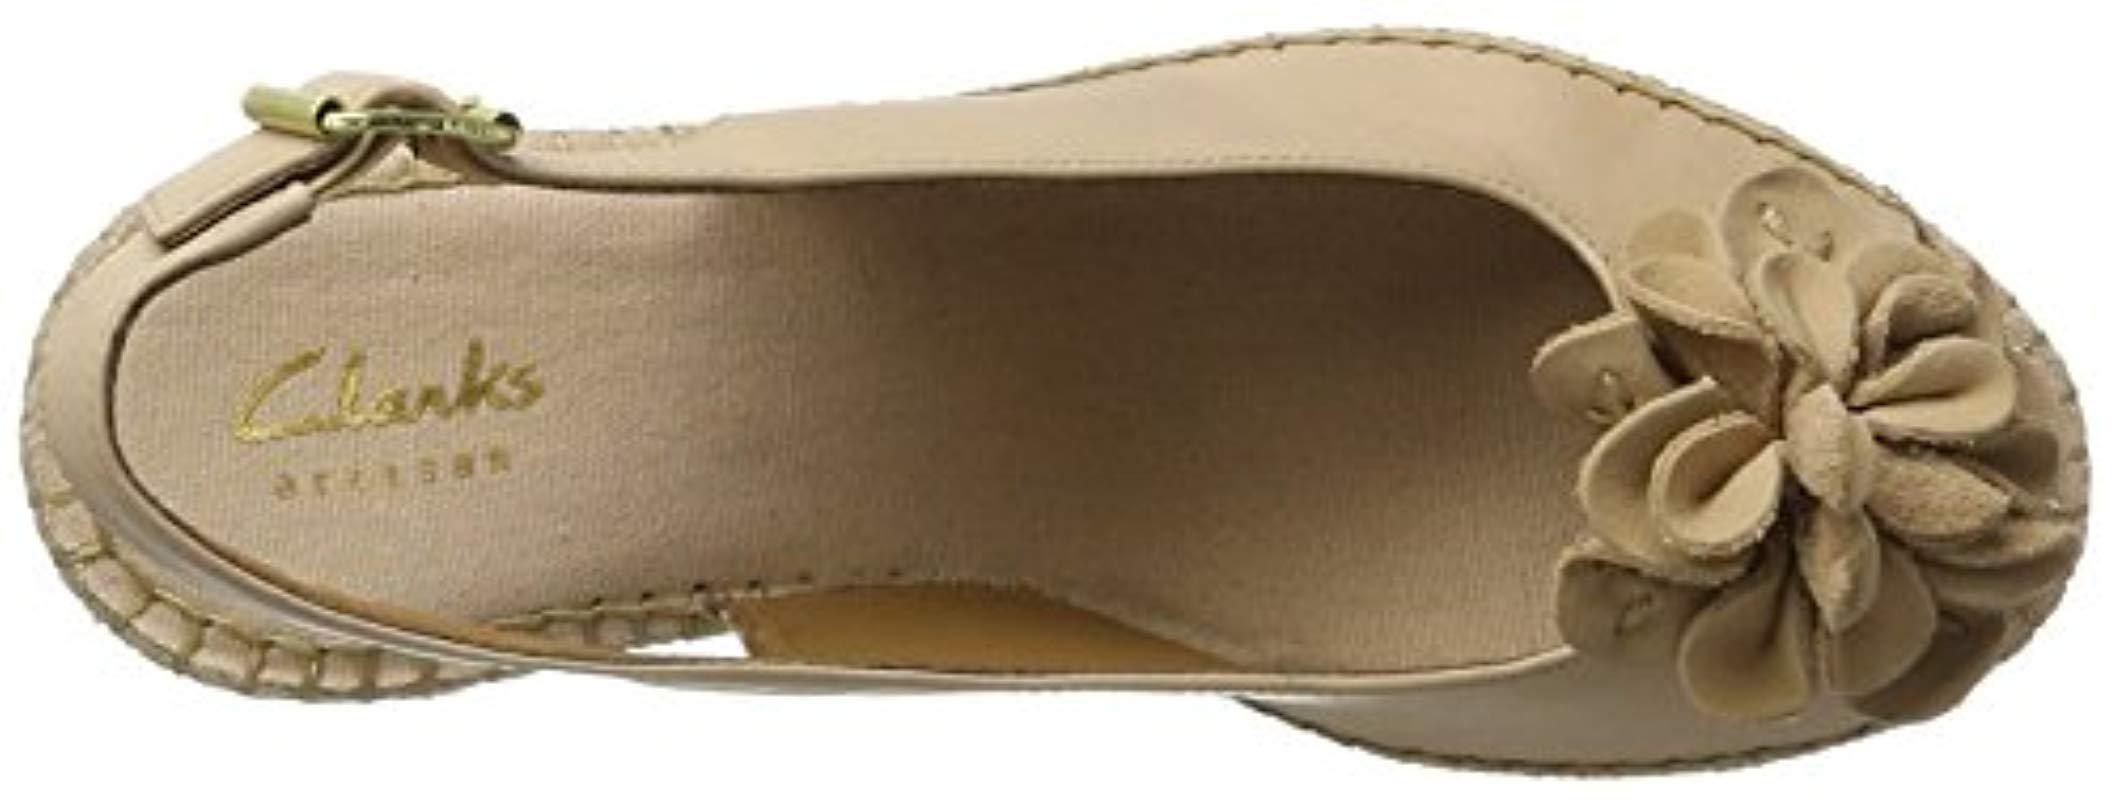 eb08e76eec9 Women's Natural 's Petrina Bianca Wedge Heels Sandals